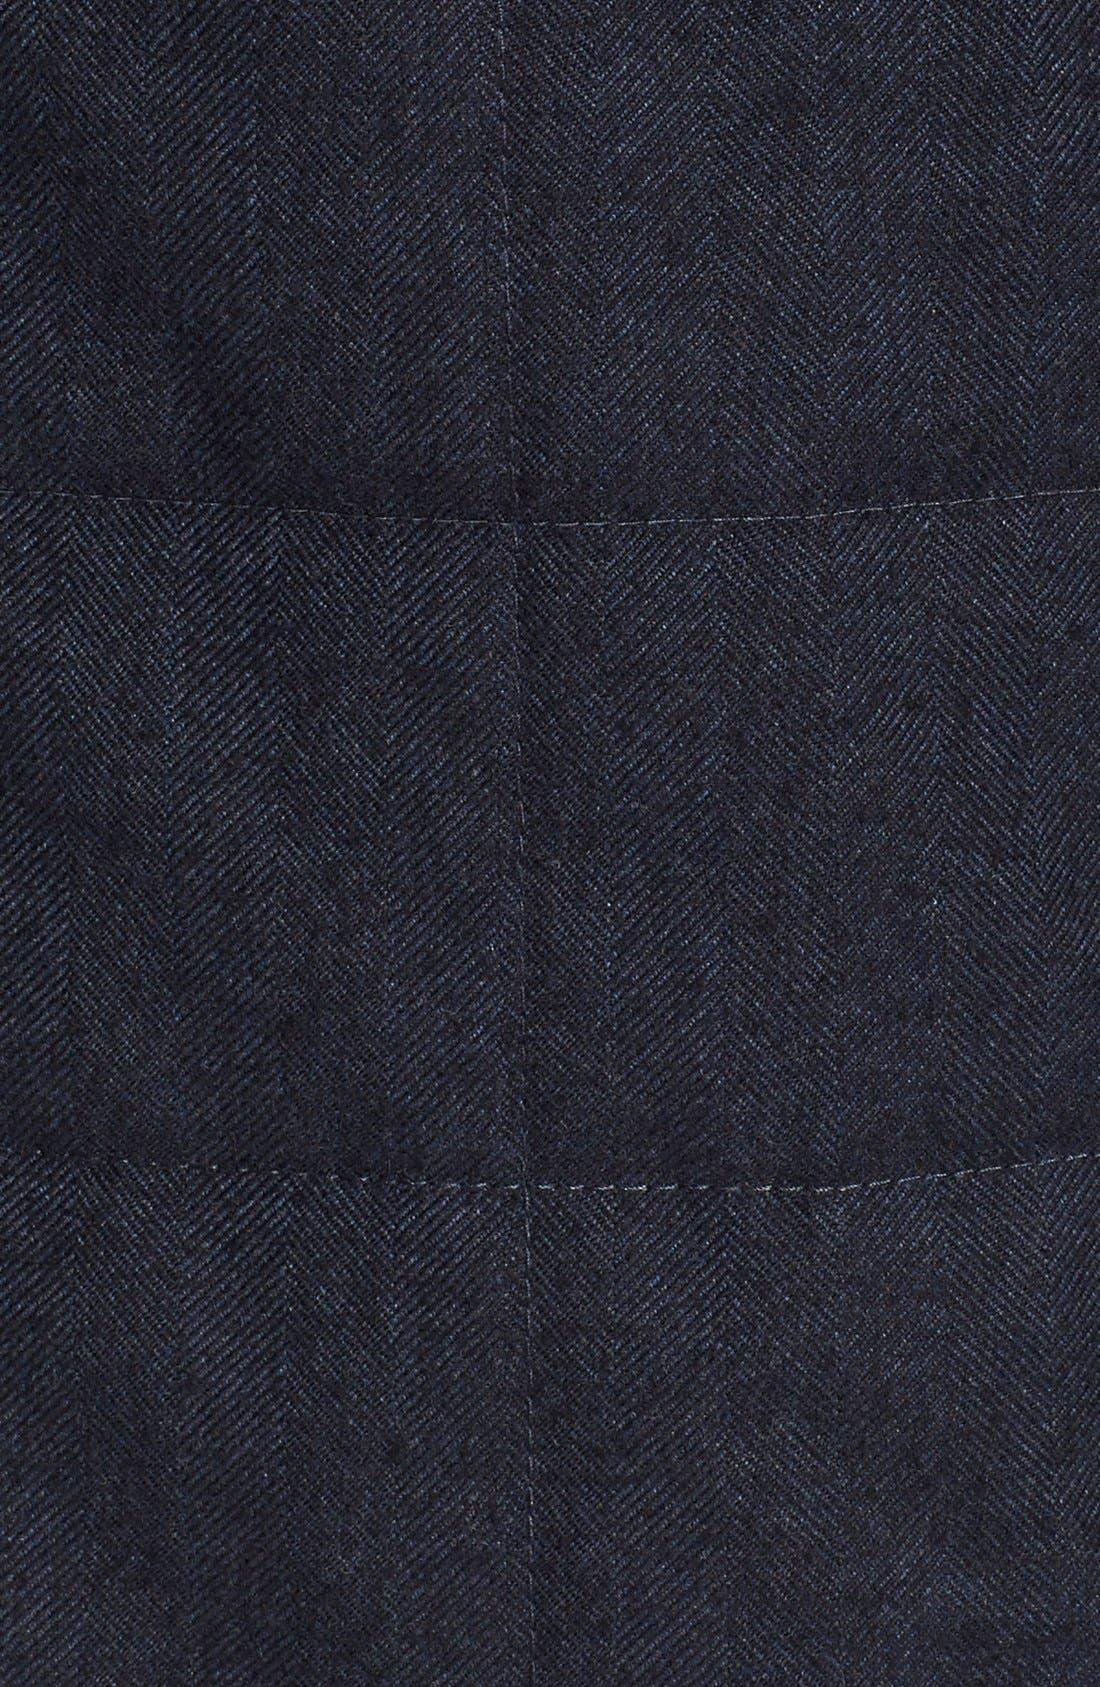 Quilted Herringbone Shirt Jacket,                             Alternate thumbnail 5, color,